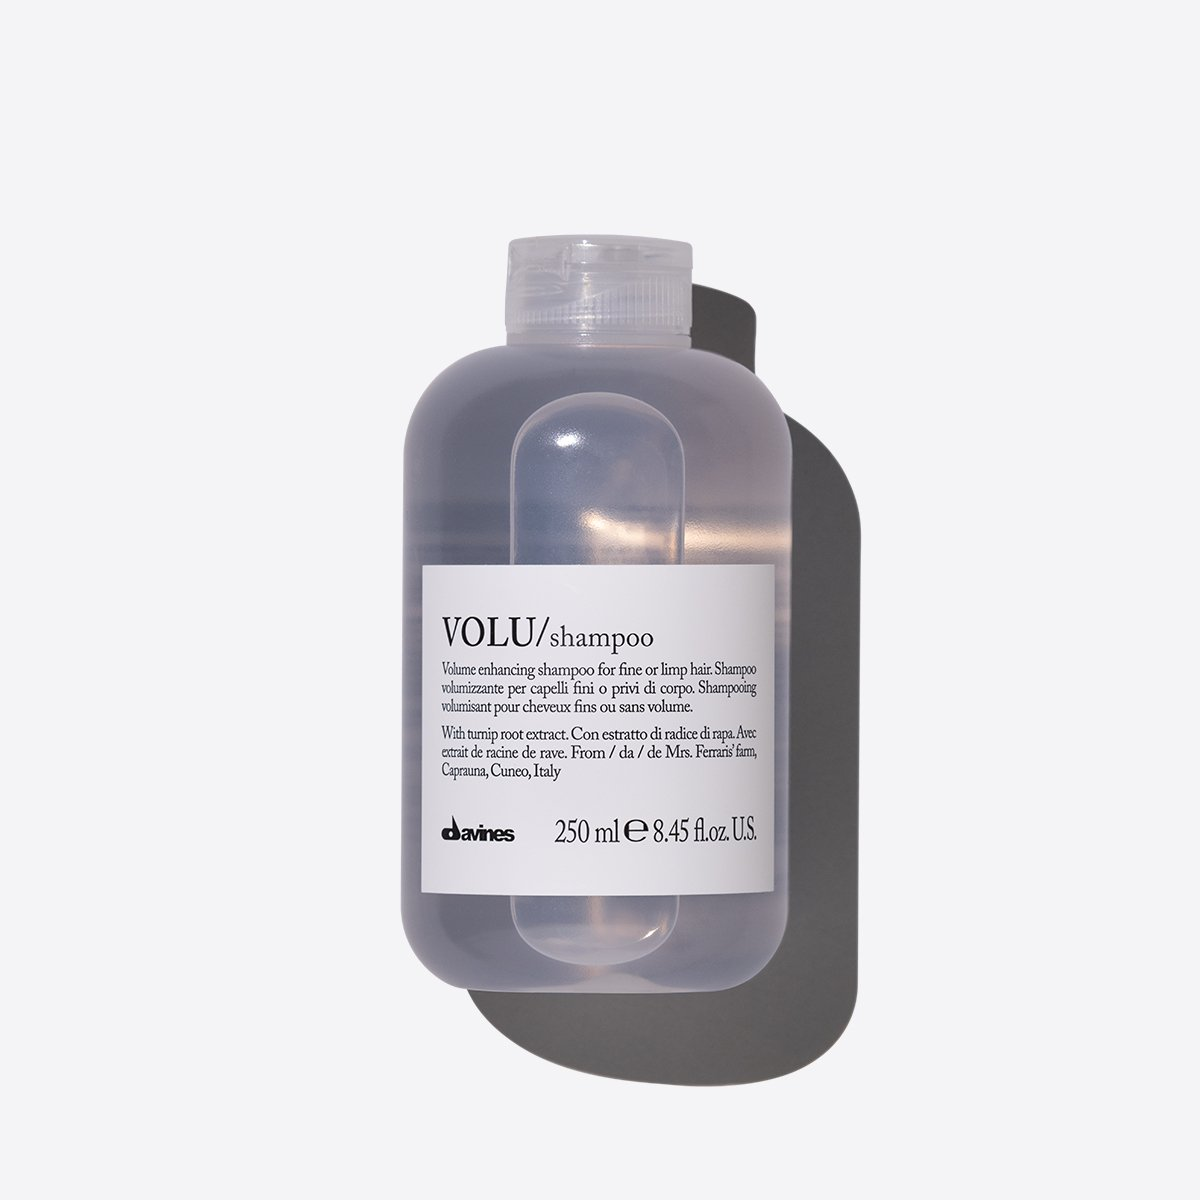 ESSENTIAL HAIRCARE VOLU Shampoo  250ml